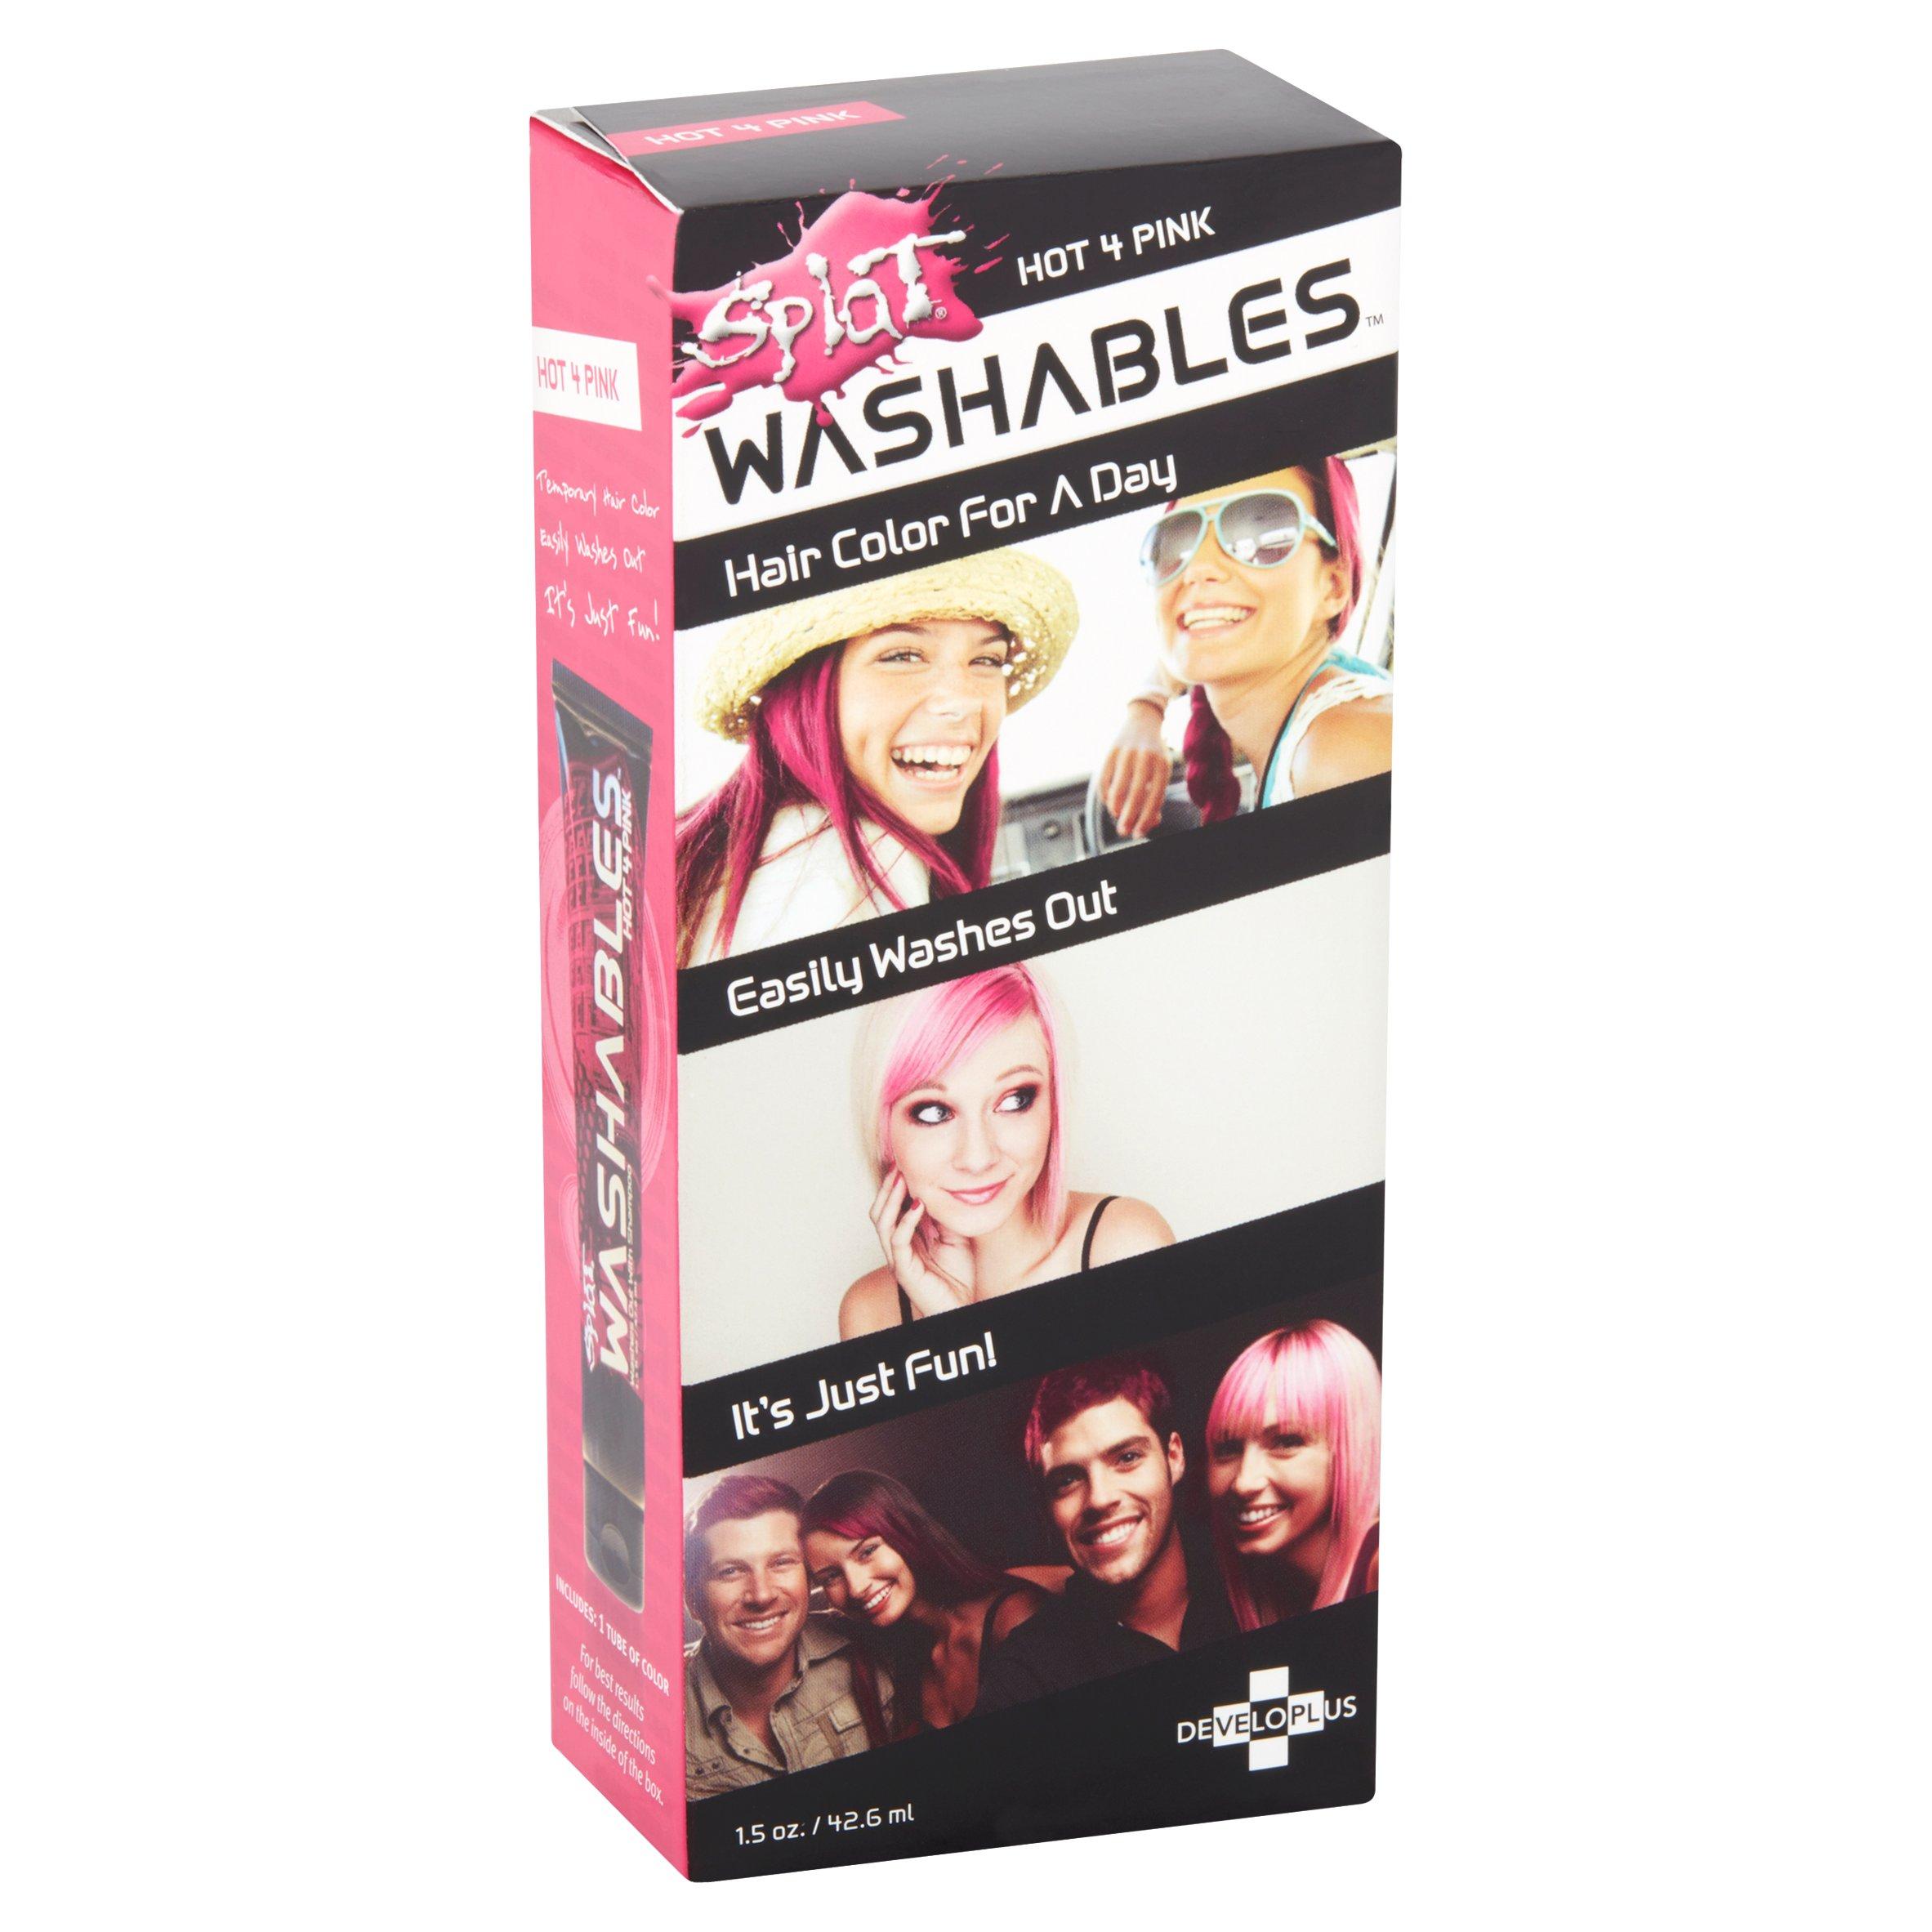 Developlus Splat Washables Hot 4 Pink Hair Color 15 Oz Walmart